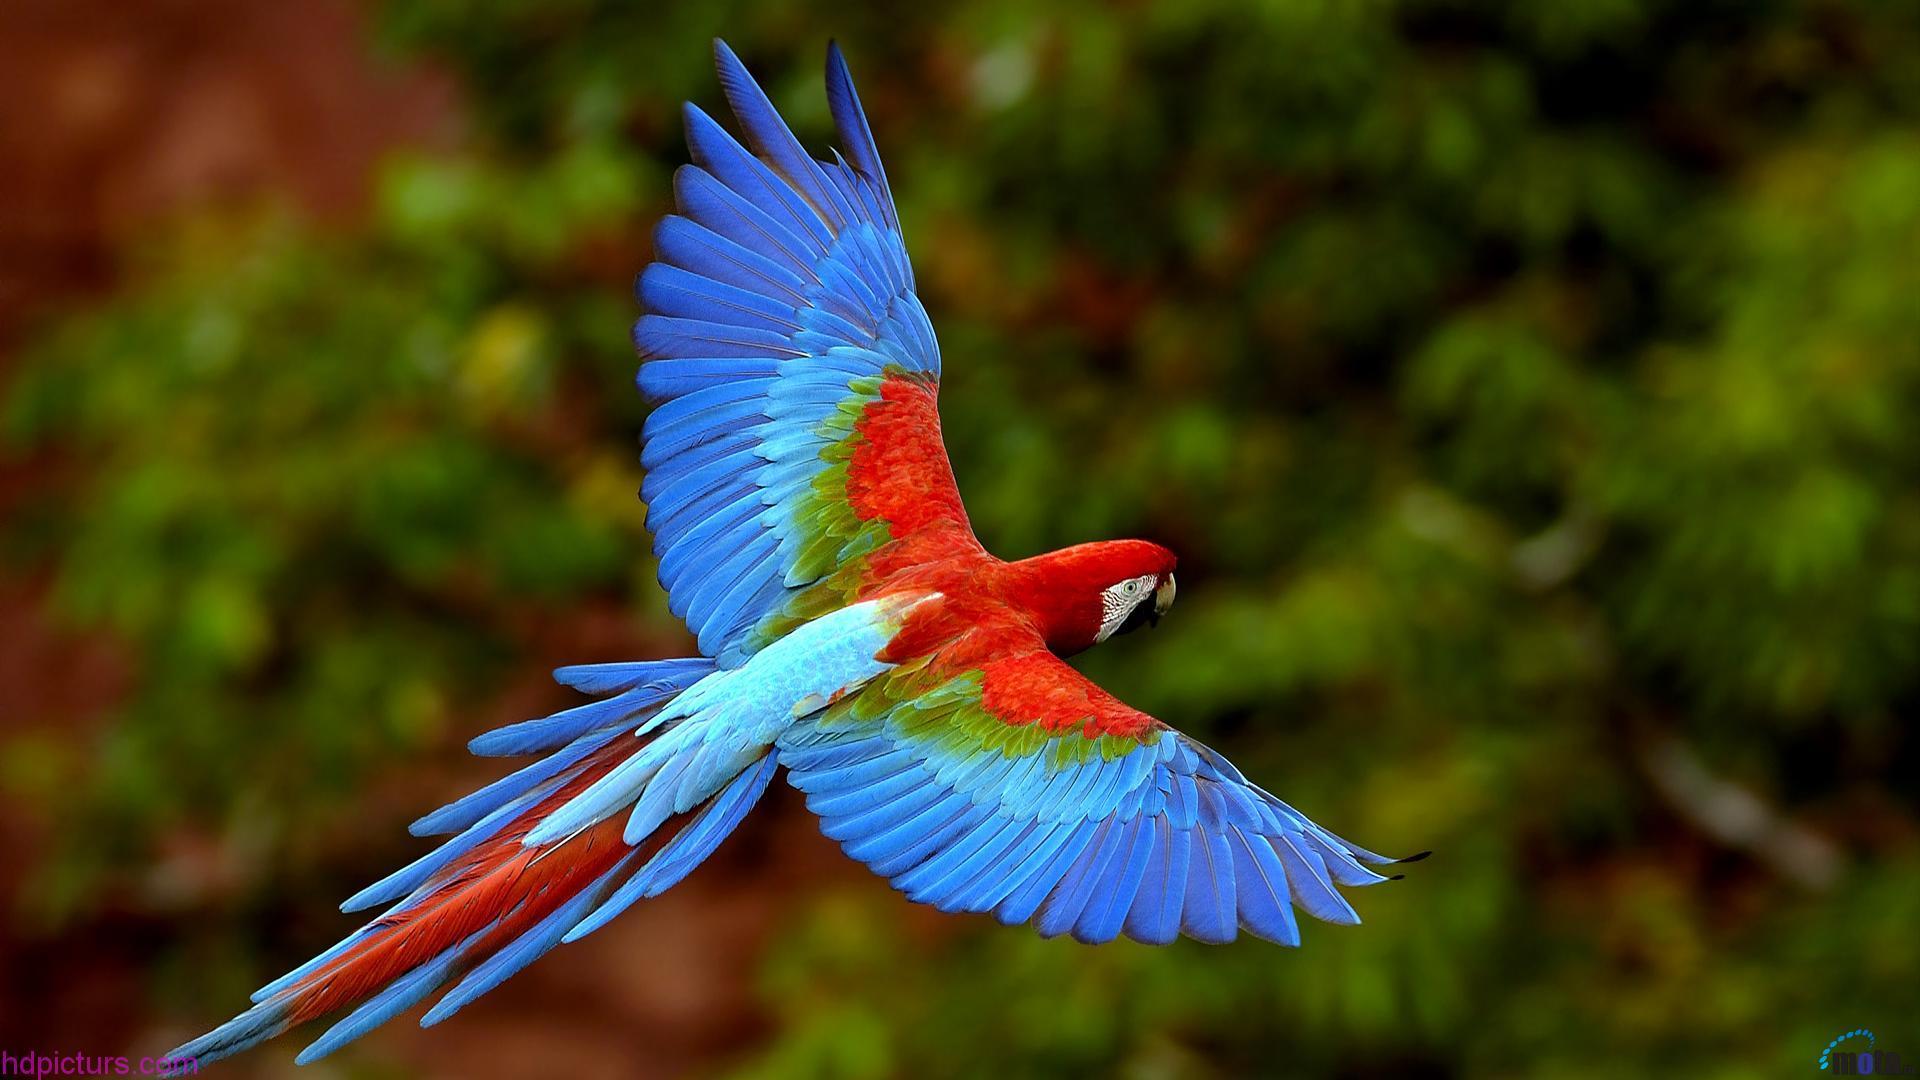 بالصور صور عصافير , اجمل صور عصافير ملونه 5696 7